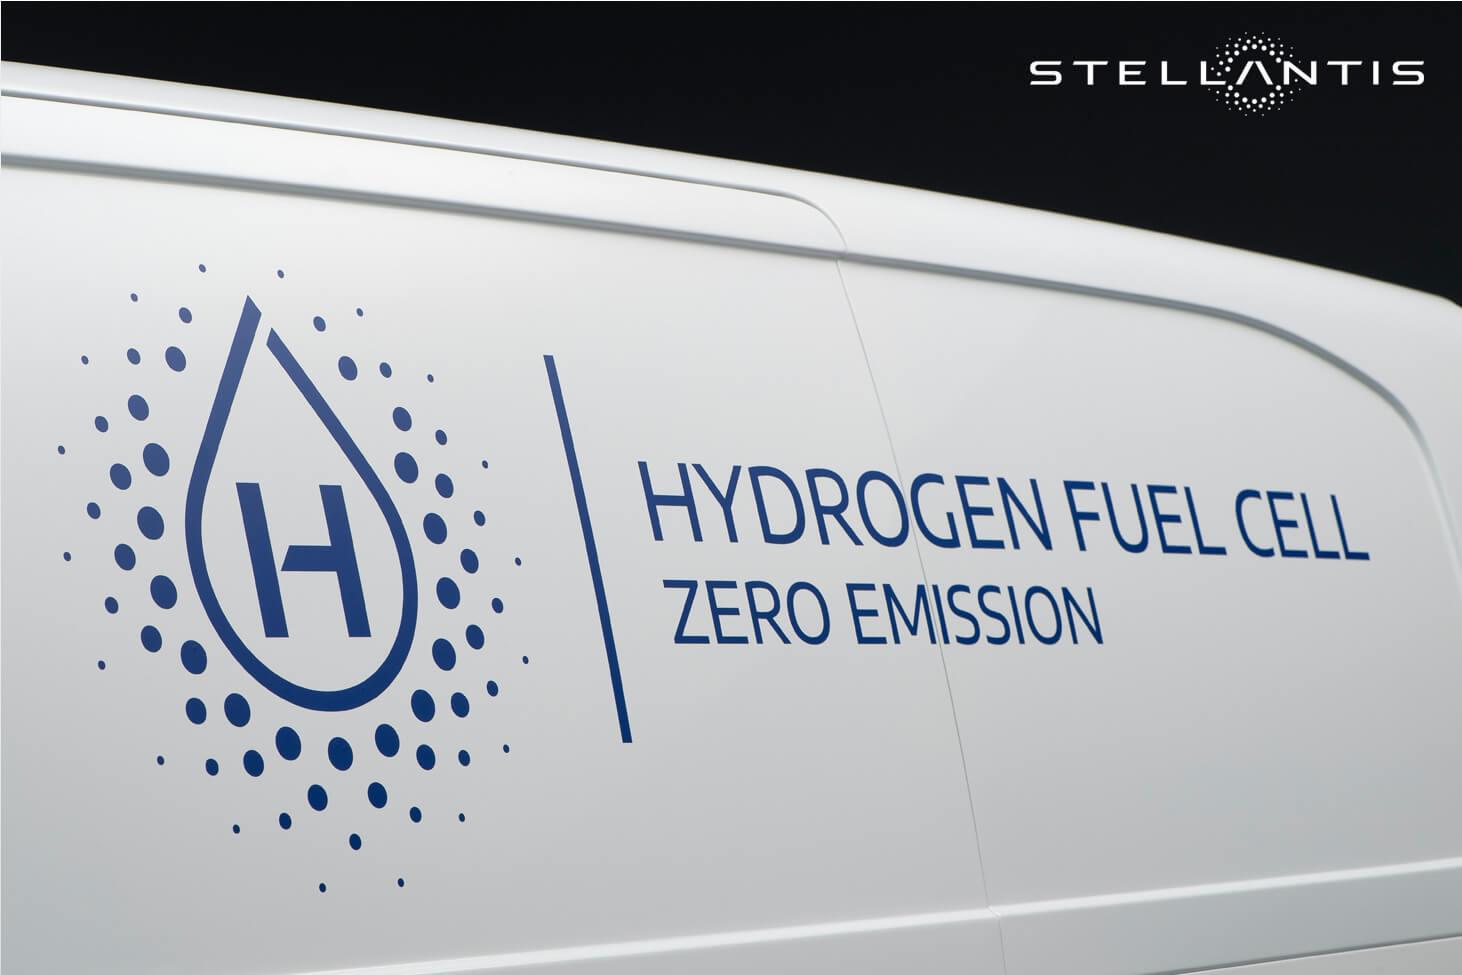 Fuel_Cell_Stellantis